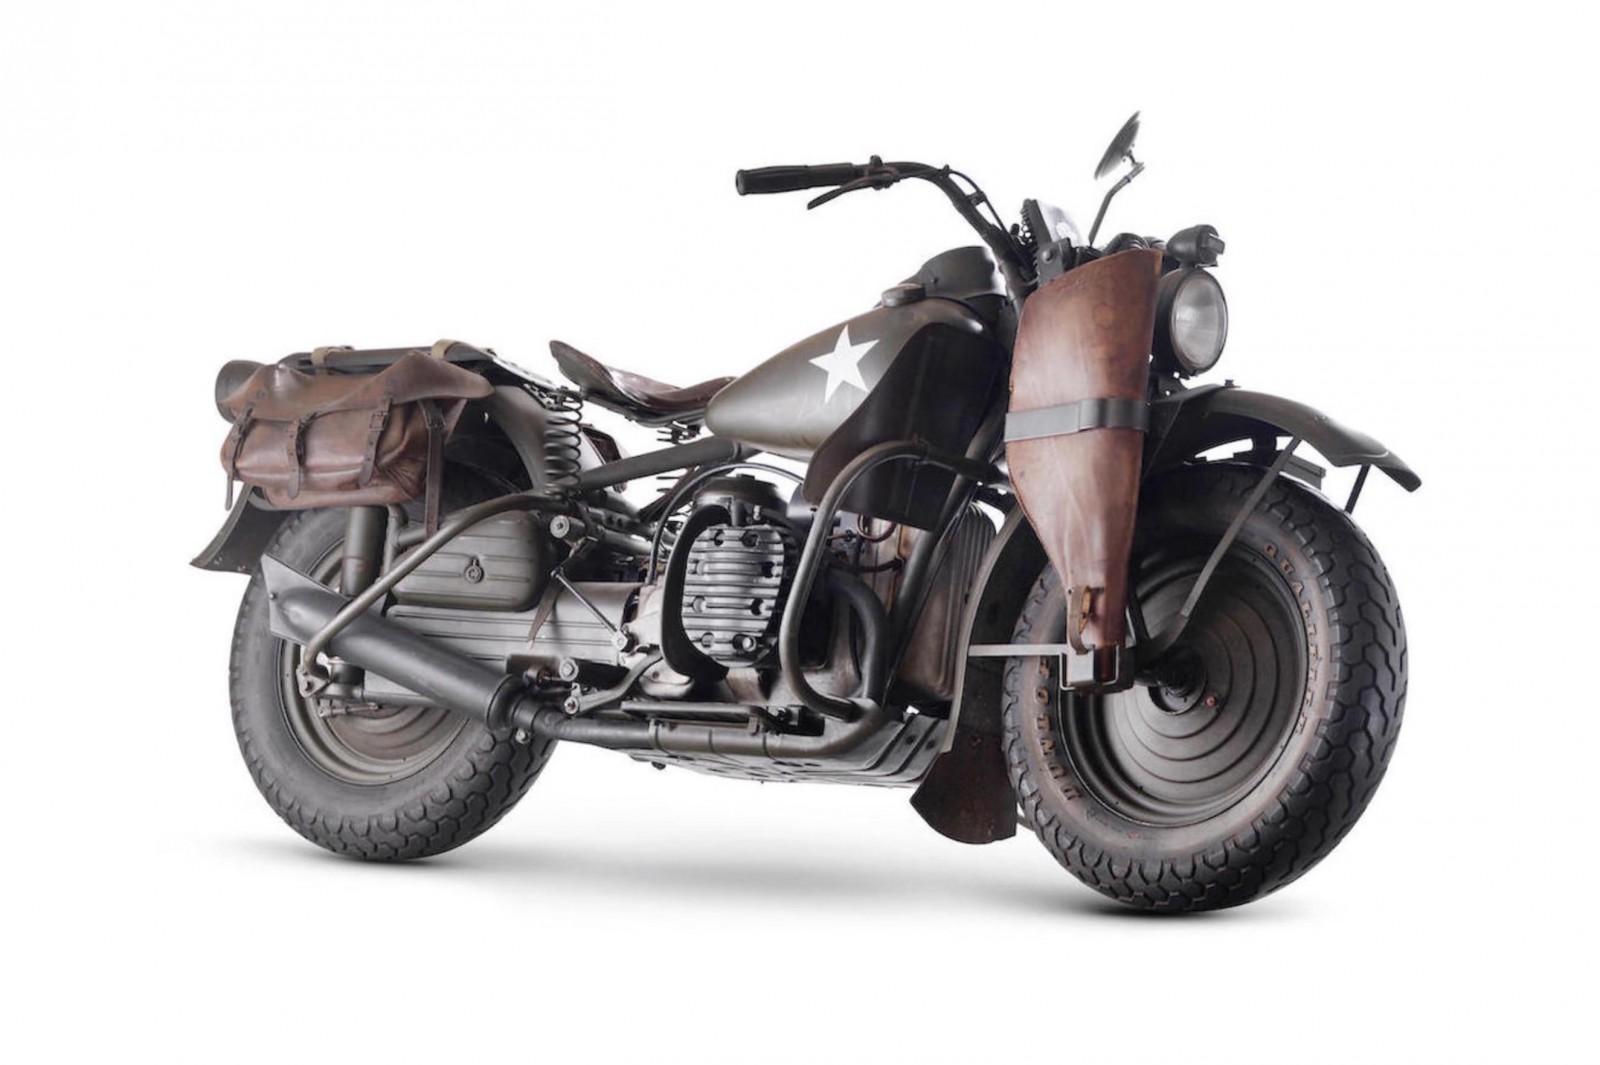 Harley Davidson 750cc XA Military Motorcycle 2 1600x1065 - Harley-Davidson XA Military Motorcycle